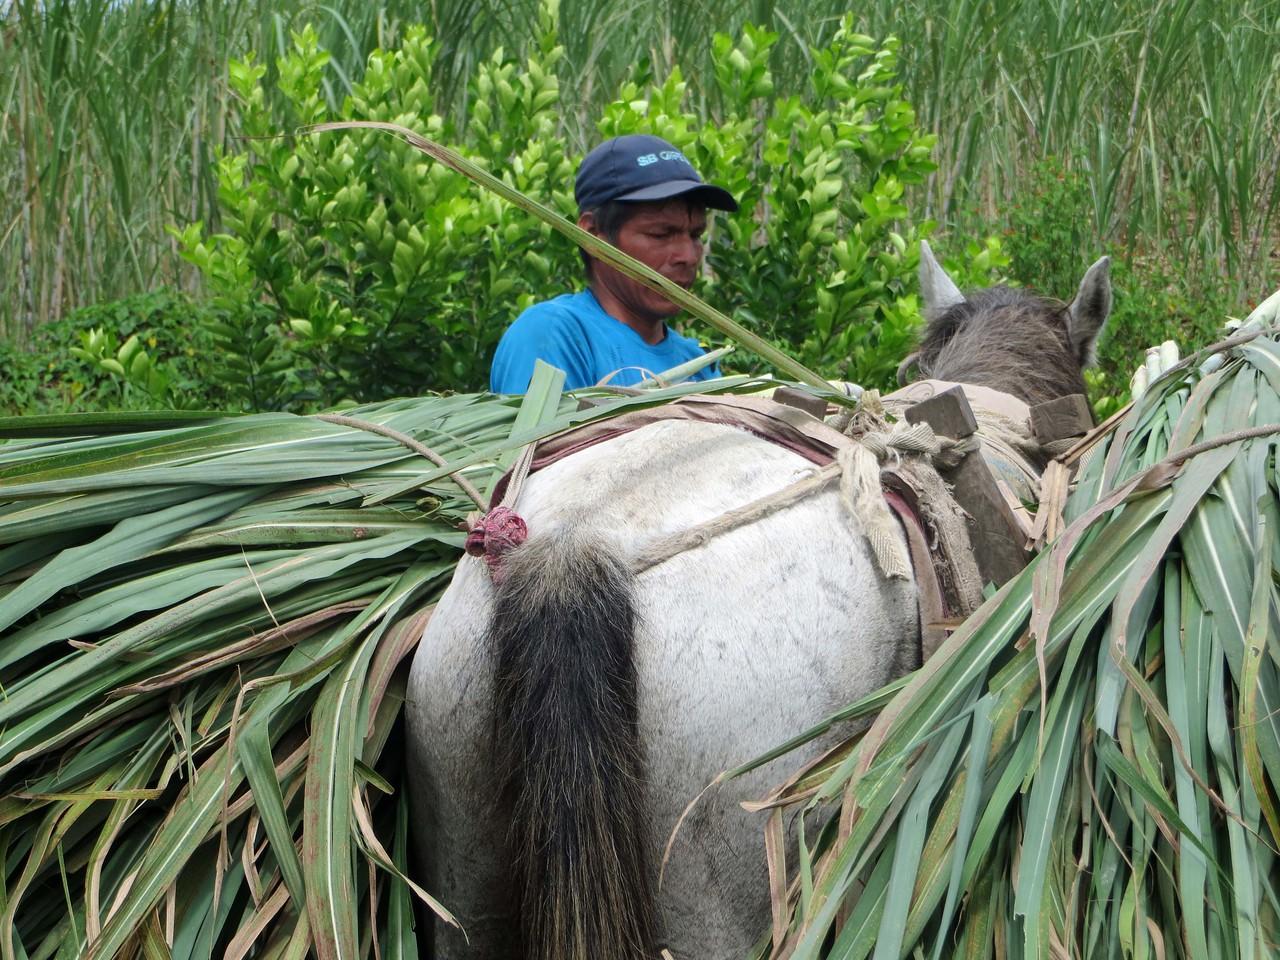 Hauling sugar cane to processing plant - Nueva Esperanza